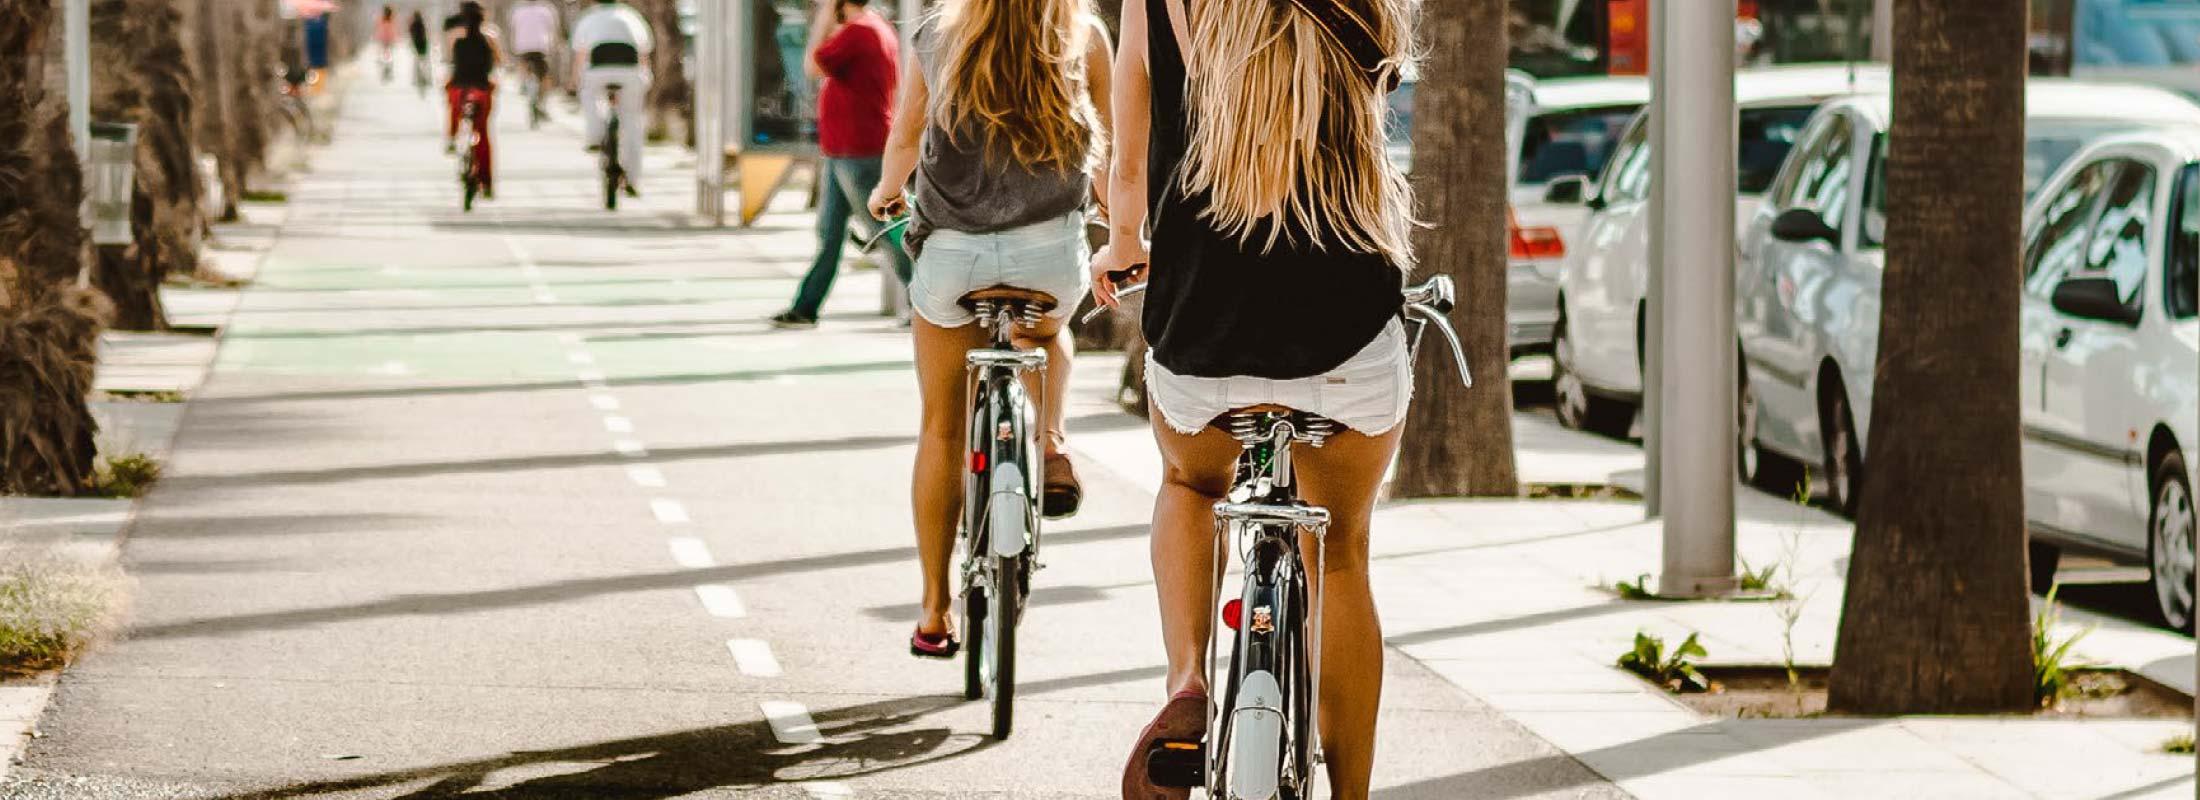 City Steel - Enjoy your bicycle